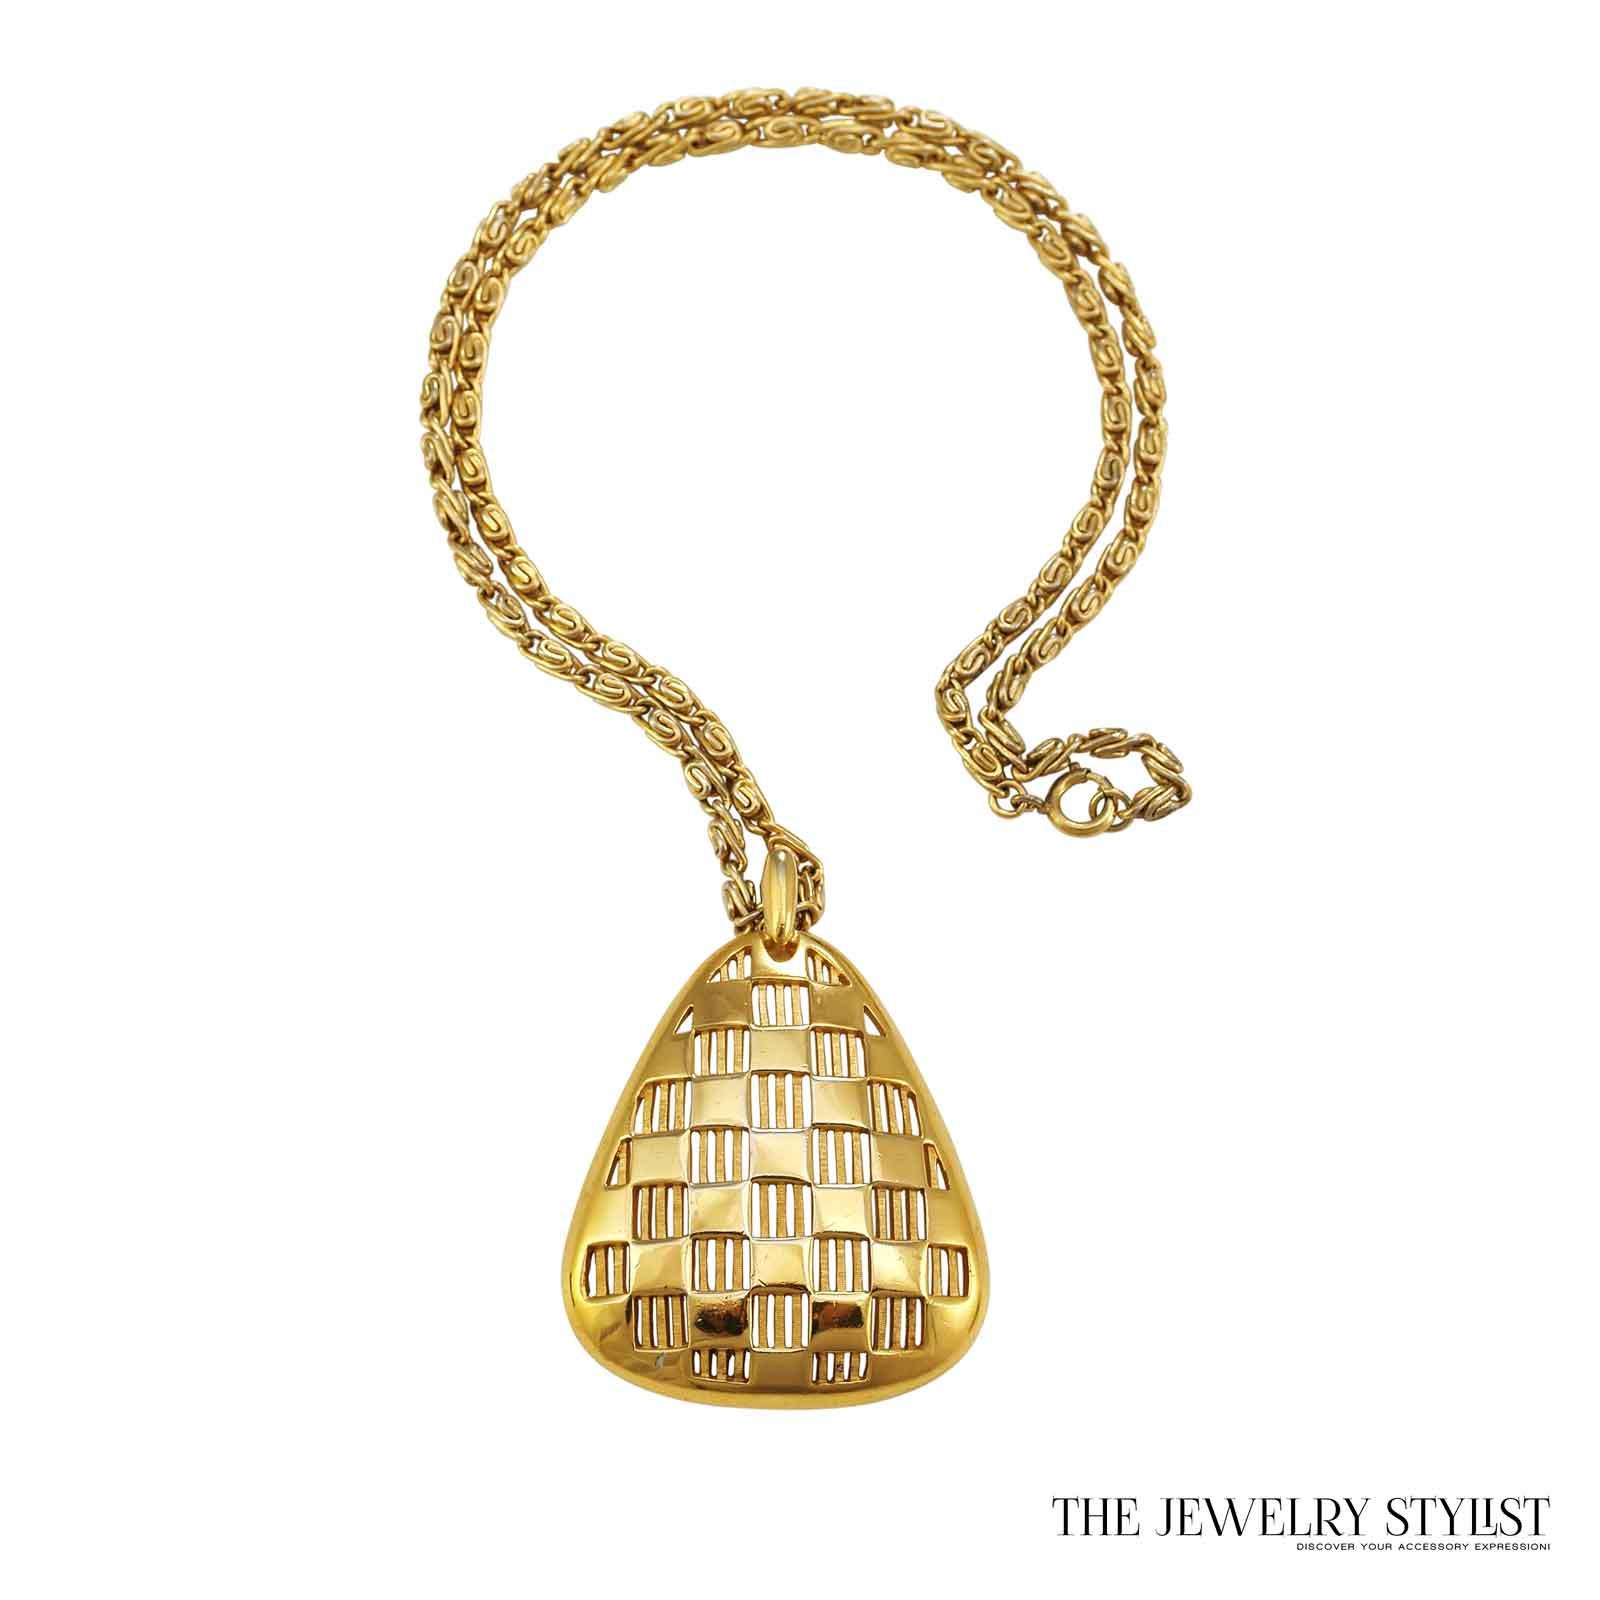 Fabulous Vintage 1970s Trifari Pendant Necklace Full Image